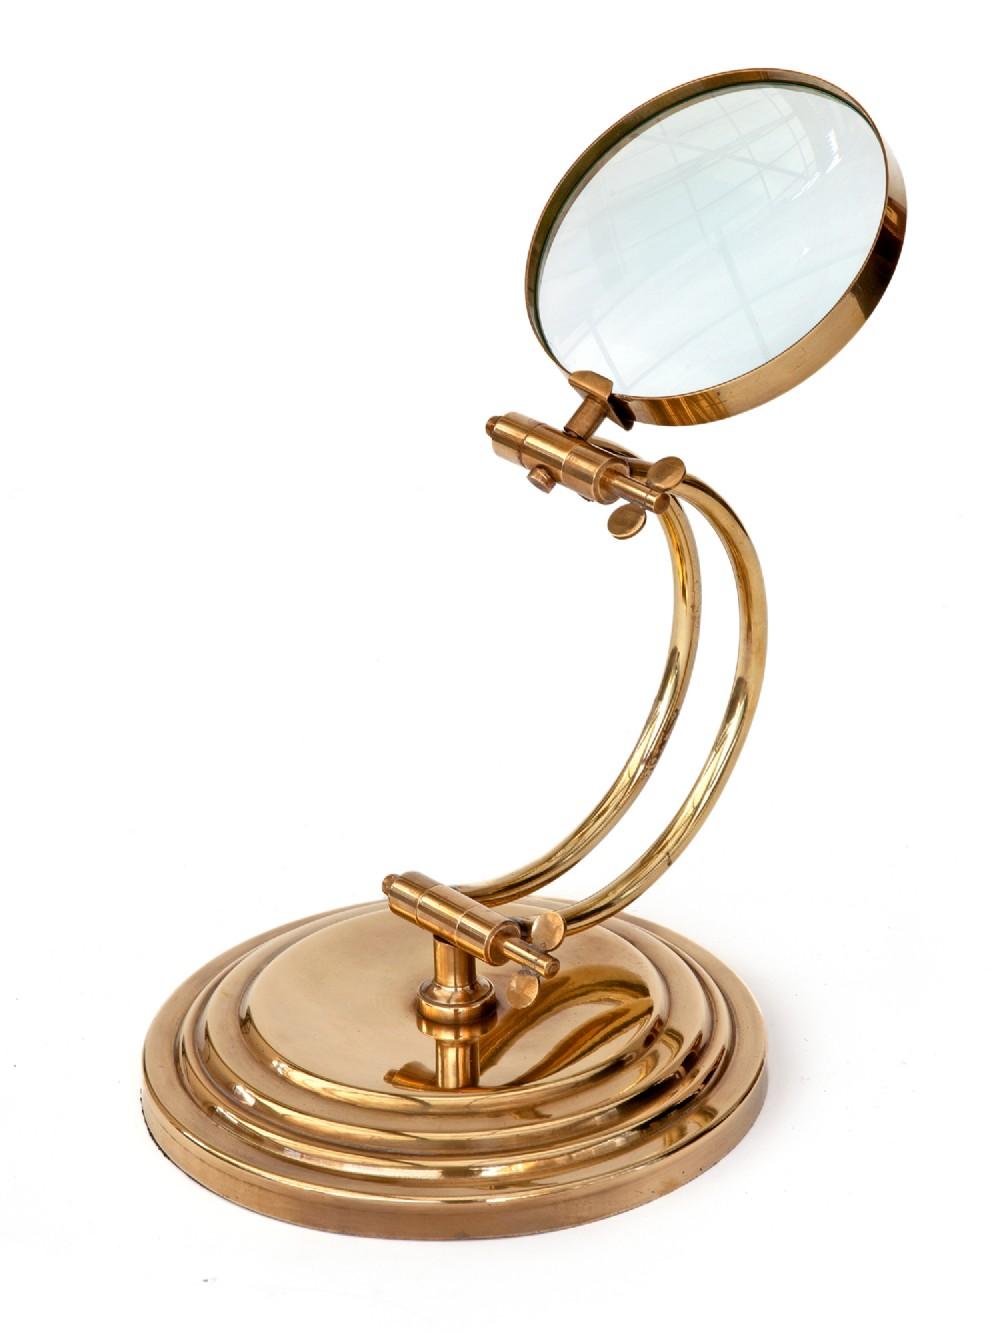 polished brass jewellers adjustable magnifying lens